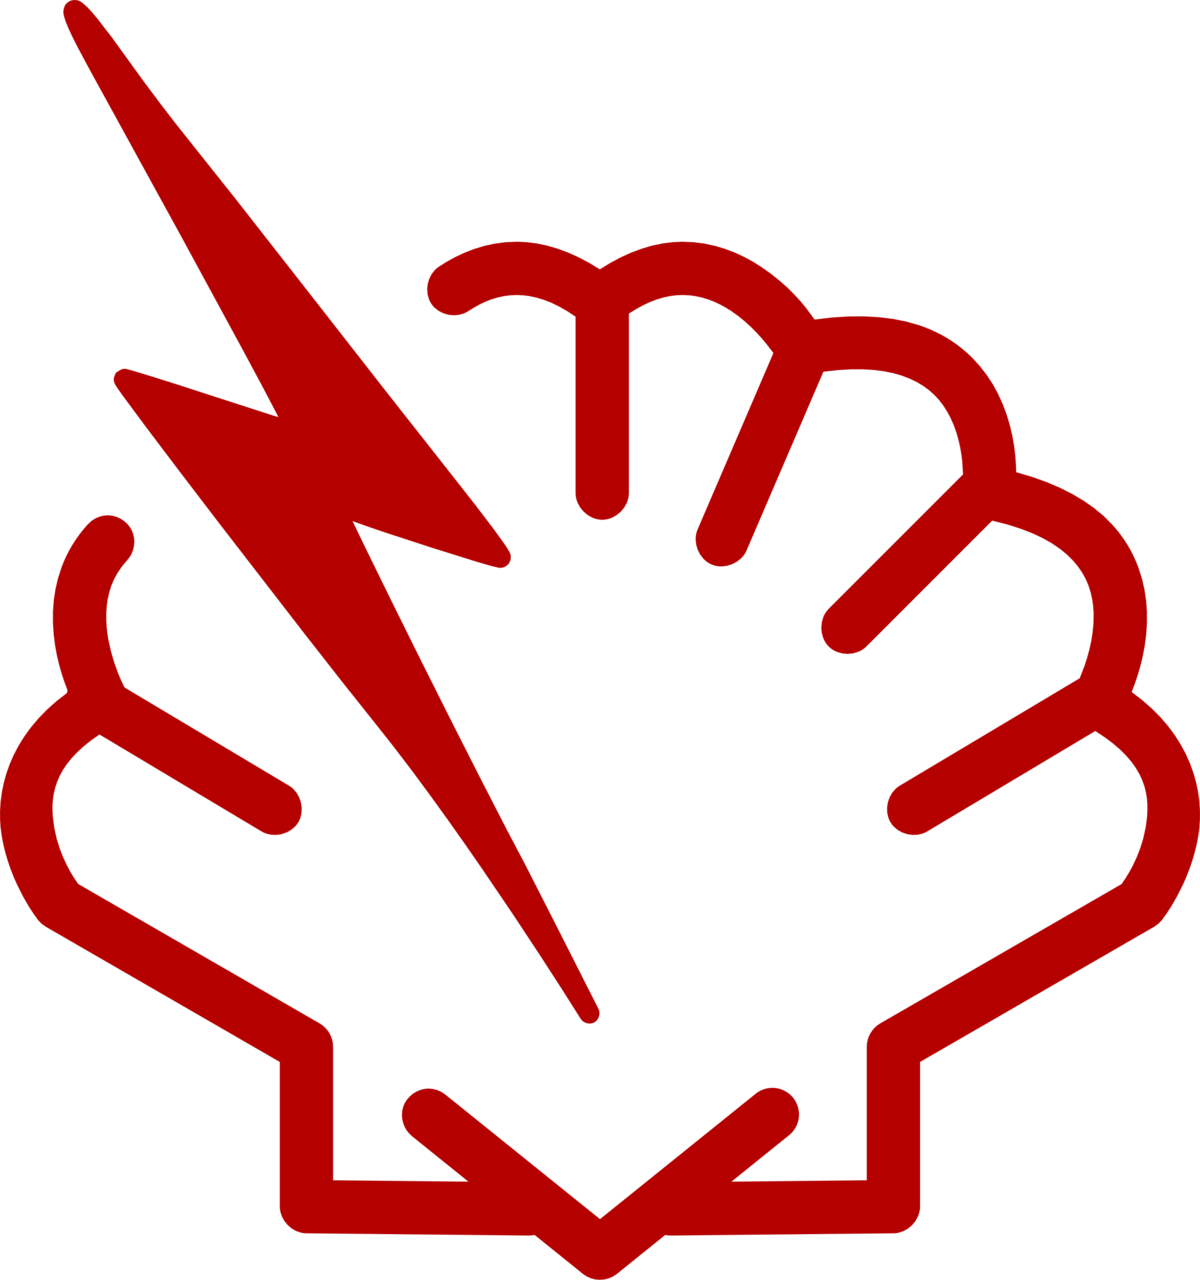 Shellshock (software bug) - Wikipedia